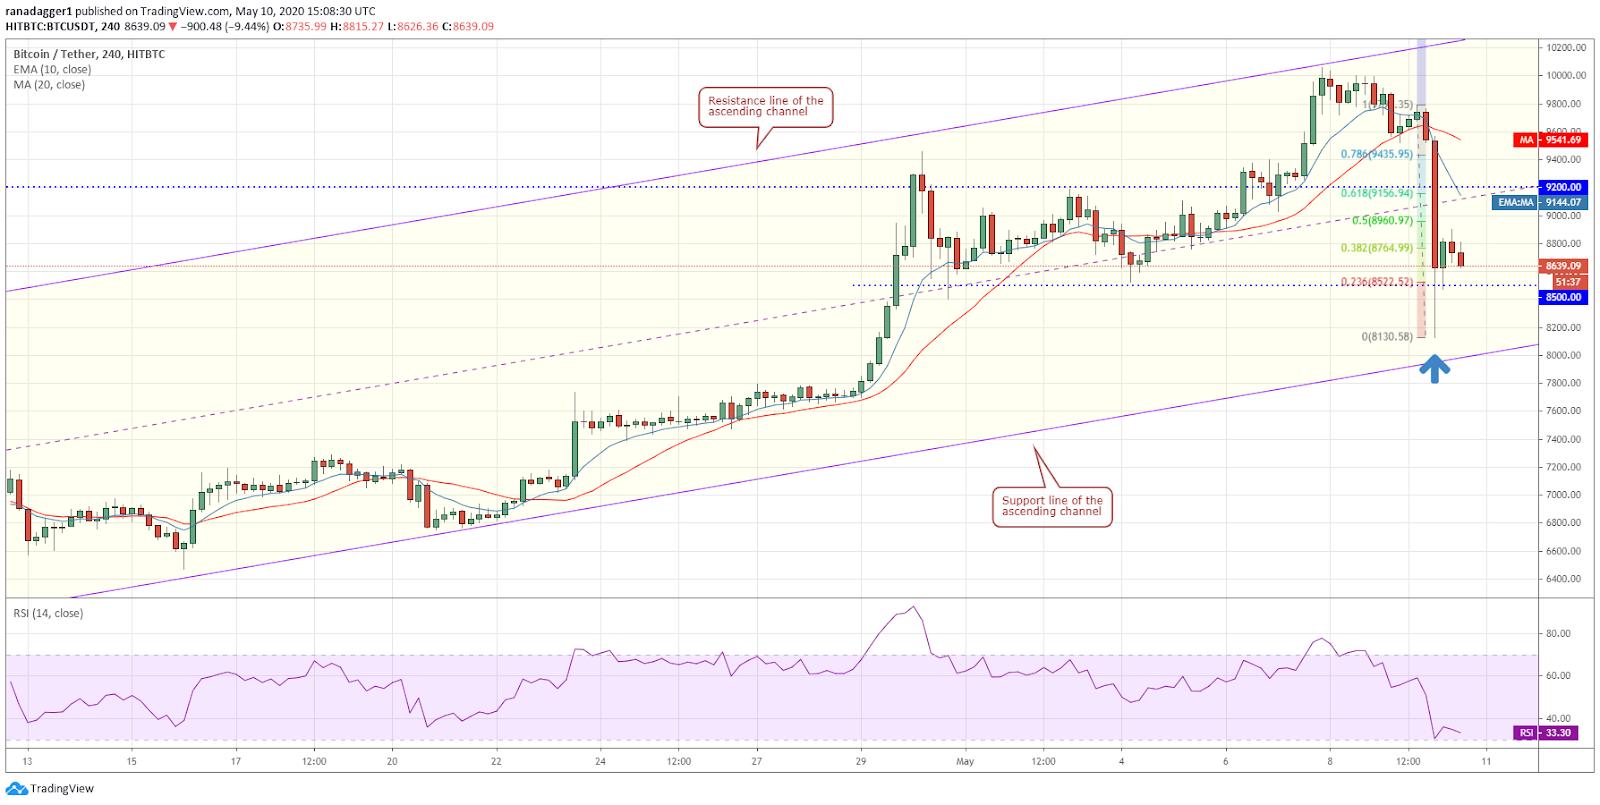 BTC-USD 4-hour chart. Source: Tradingview